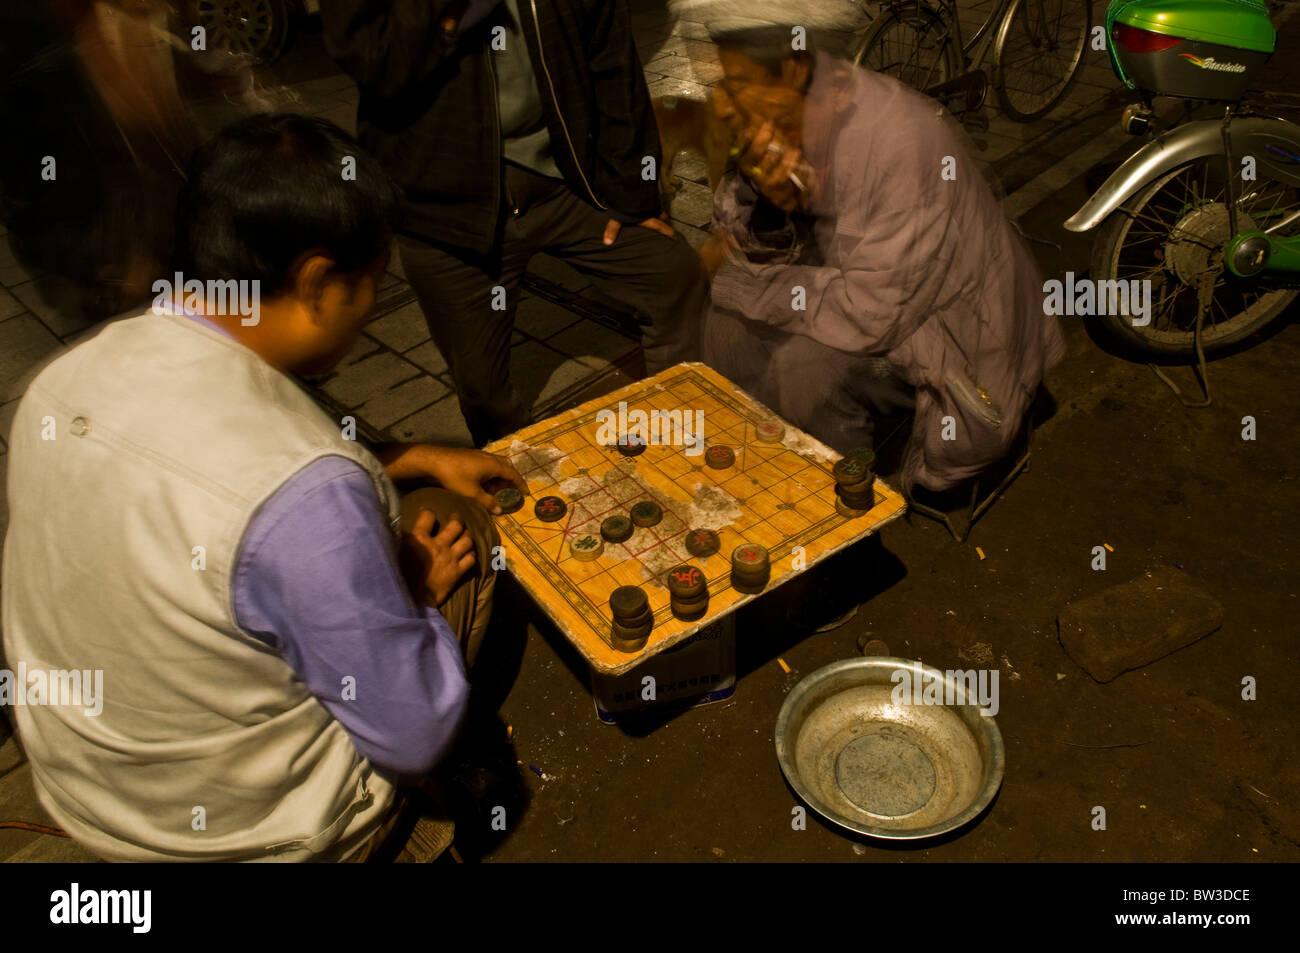 Men playing Xiangqi - Chiness chess. - Stock Image